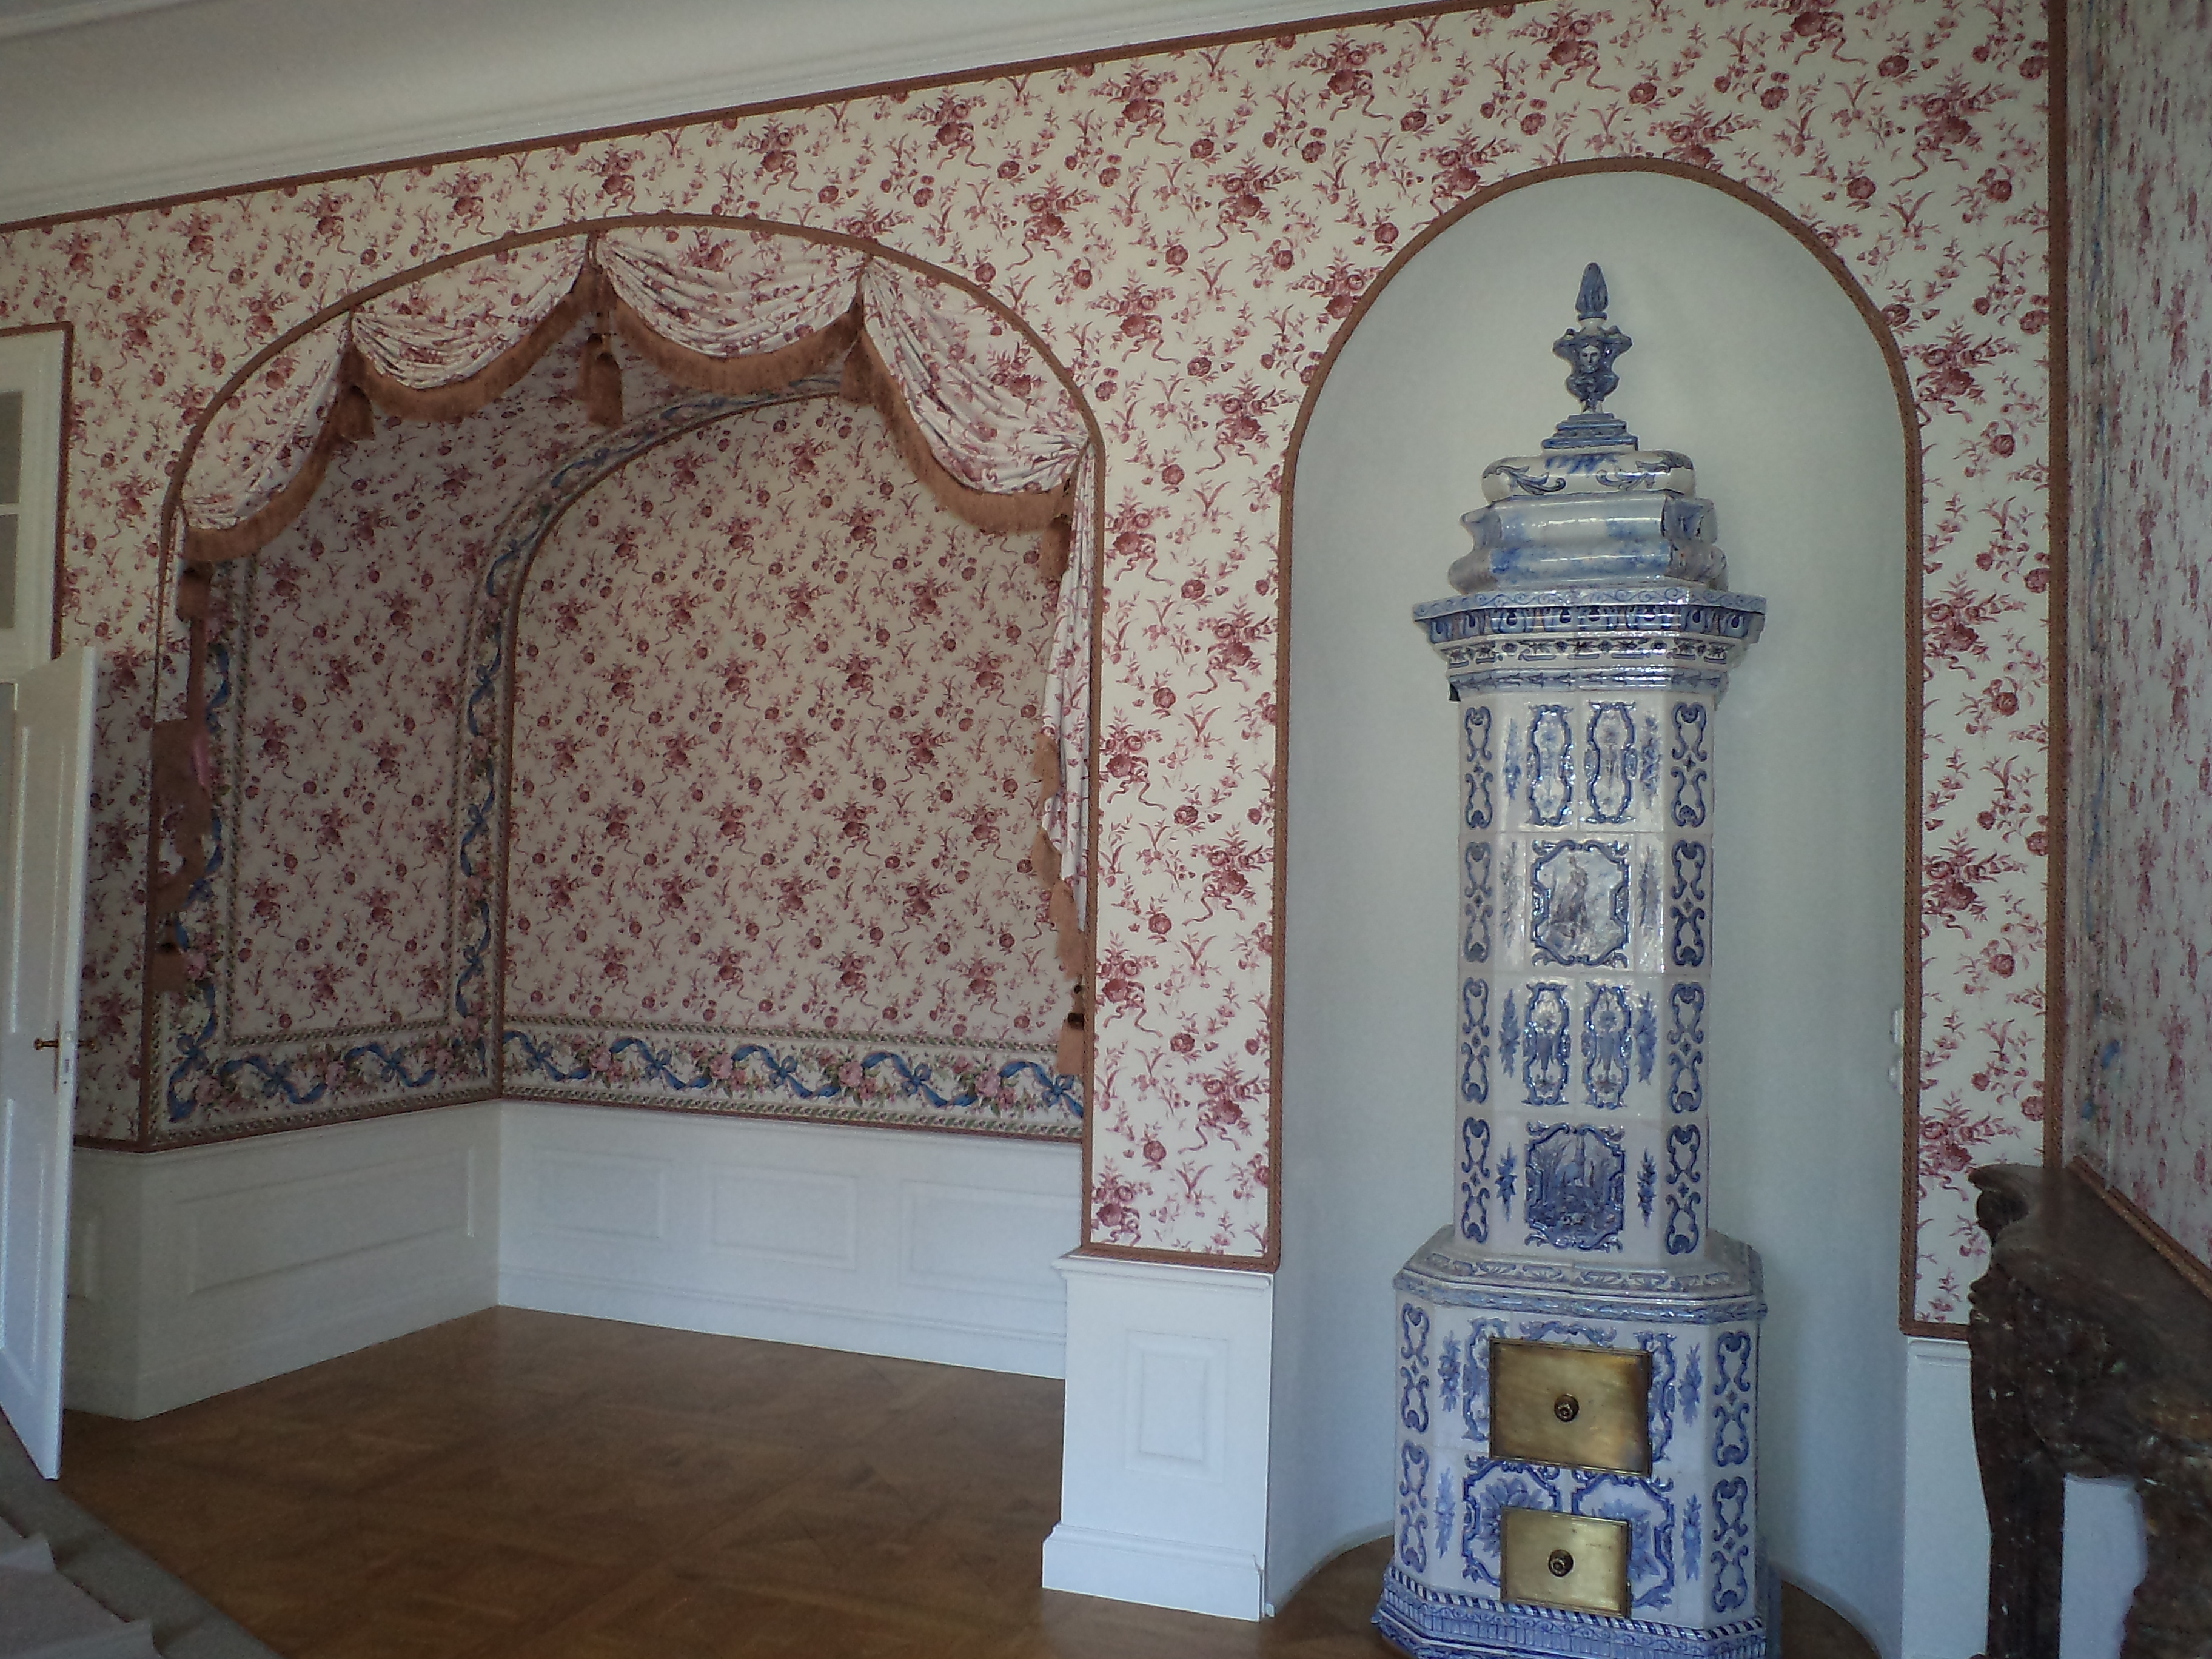 Photo 5. Rosa's Bedroom